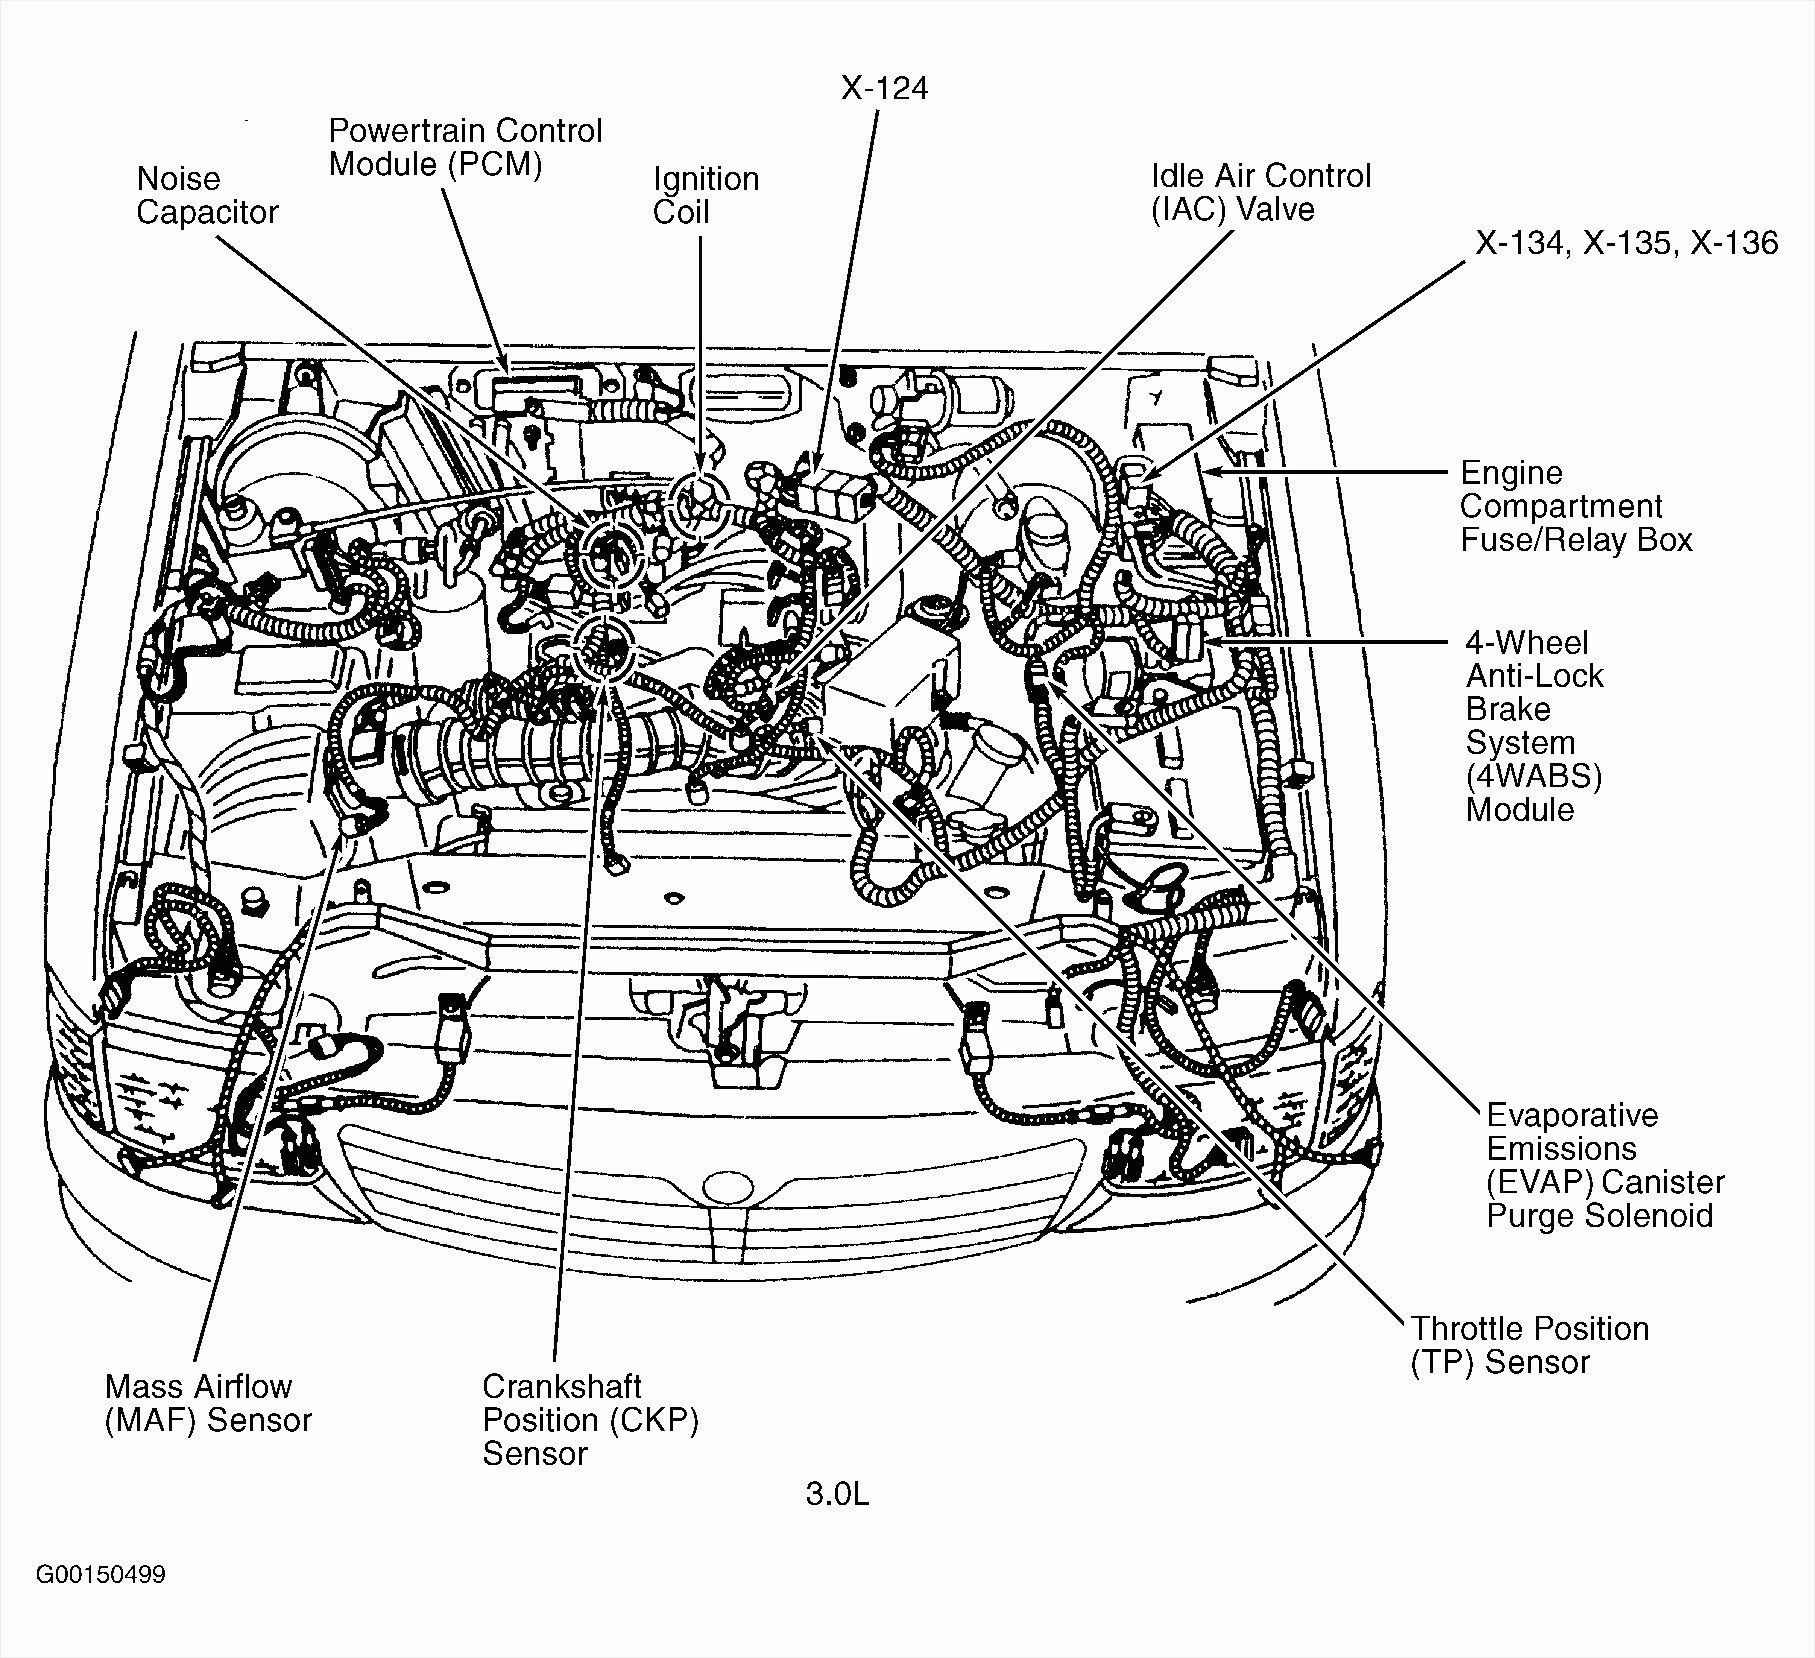 Vw Jetta 2 5l Engine Diagram - 2010 Jeep Wrangler Wiring Diagrams -  astrany-honda.kdx-200.jeanjaures37.fr | 2005 Jetta 2 5 Engine Diagram |  | Wiring Diagram Resource